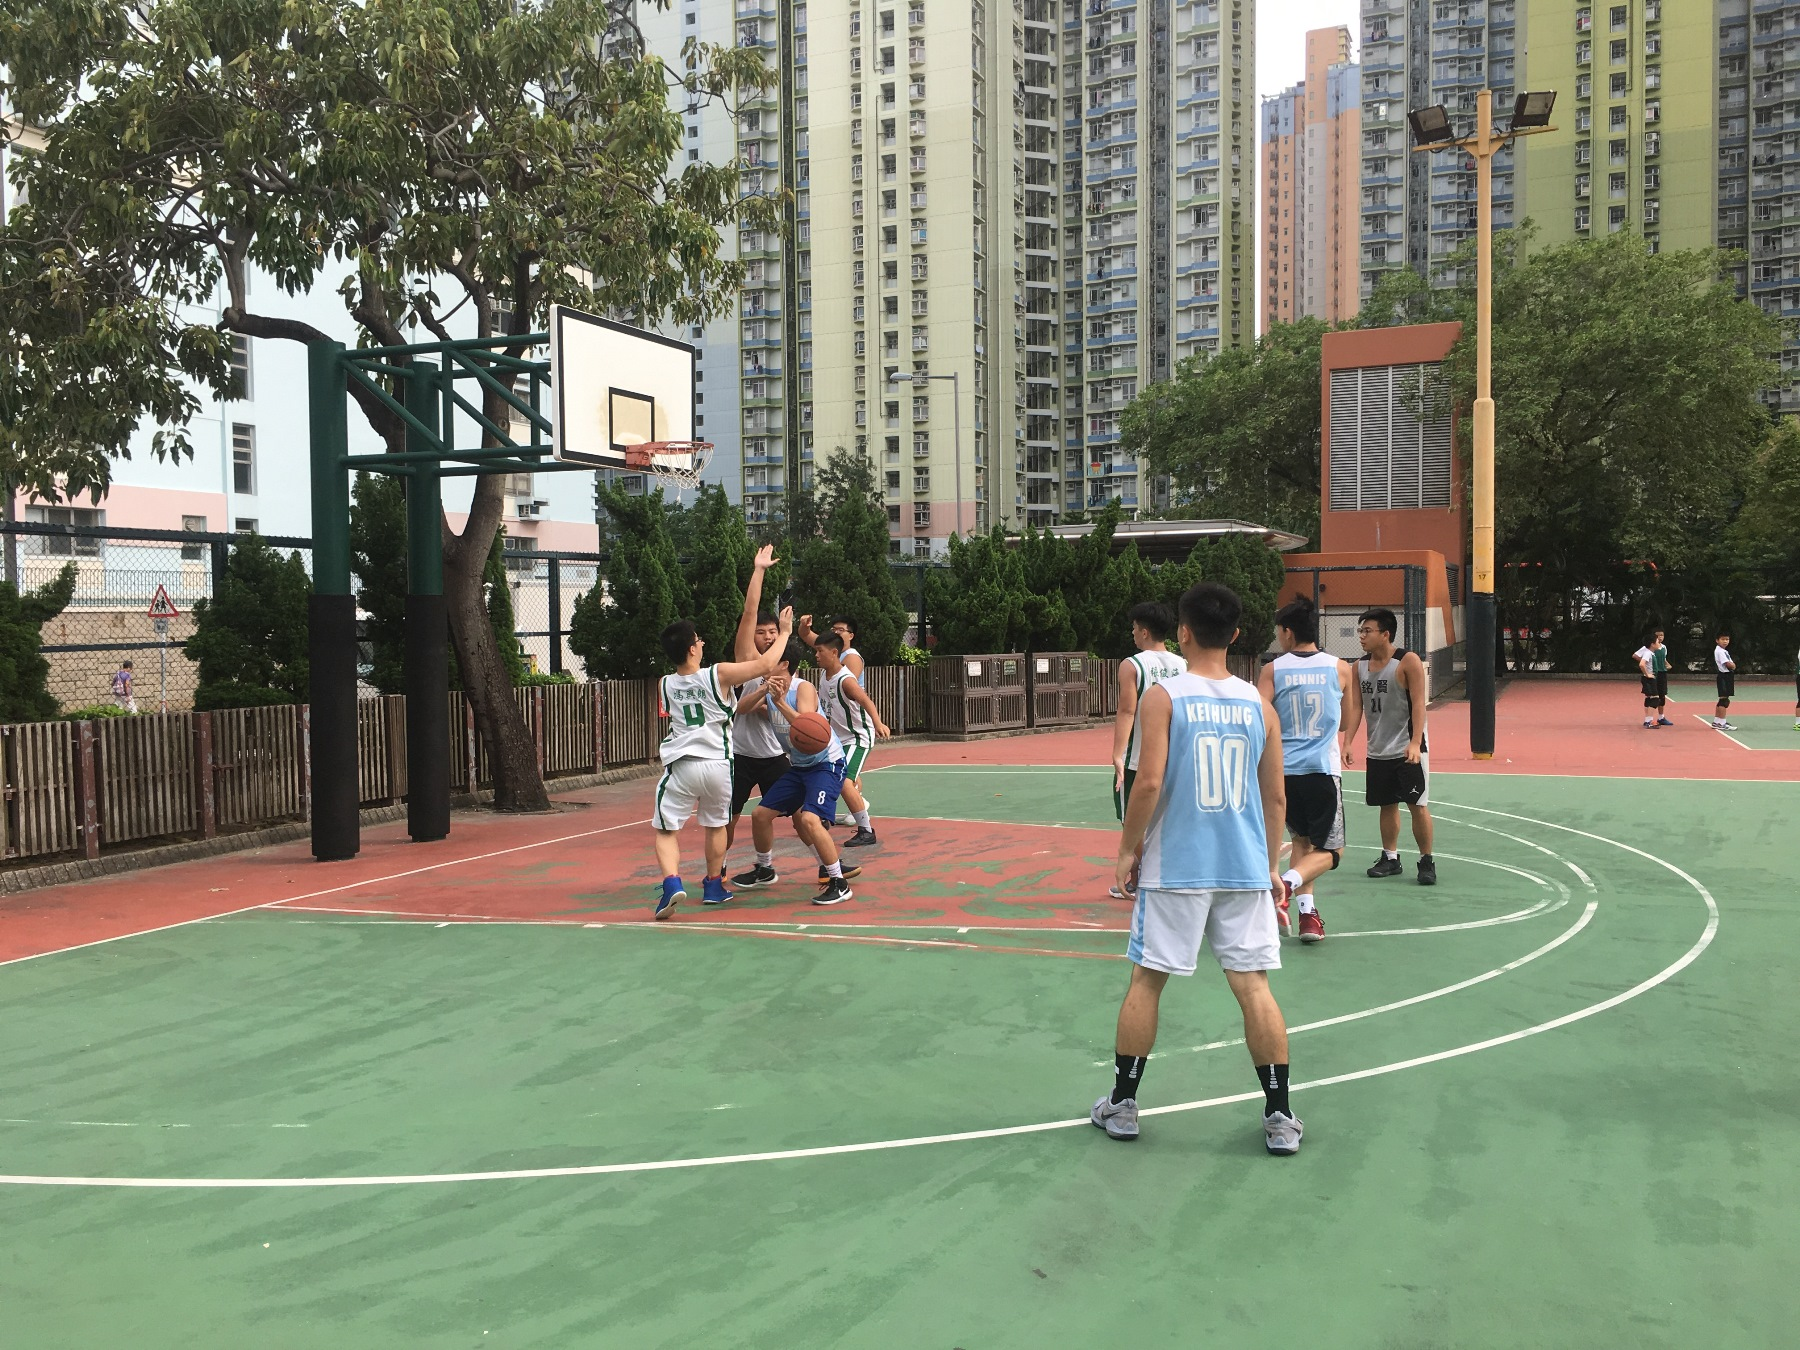 http://npc.edu.hk/sites/default/files/img_4633.jpg